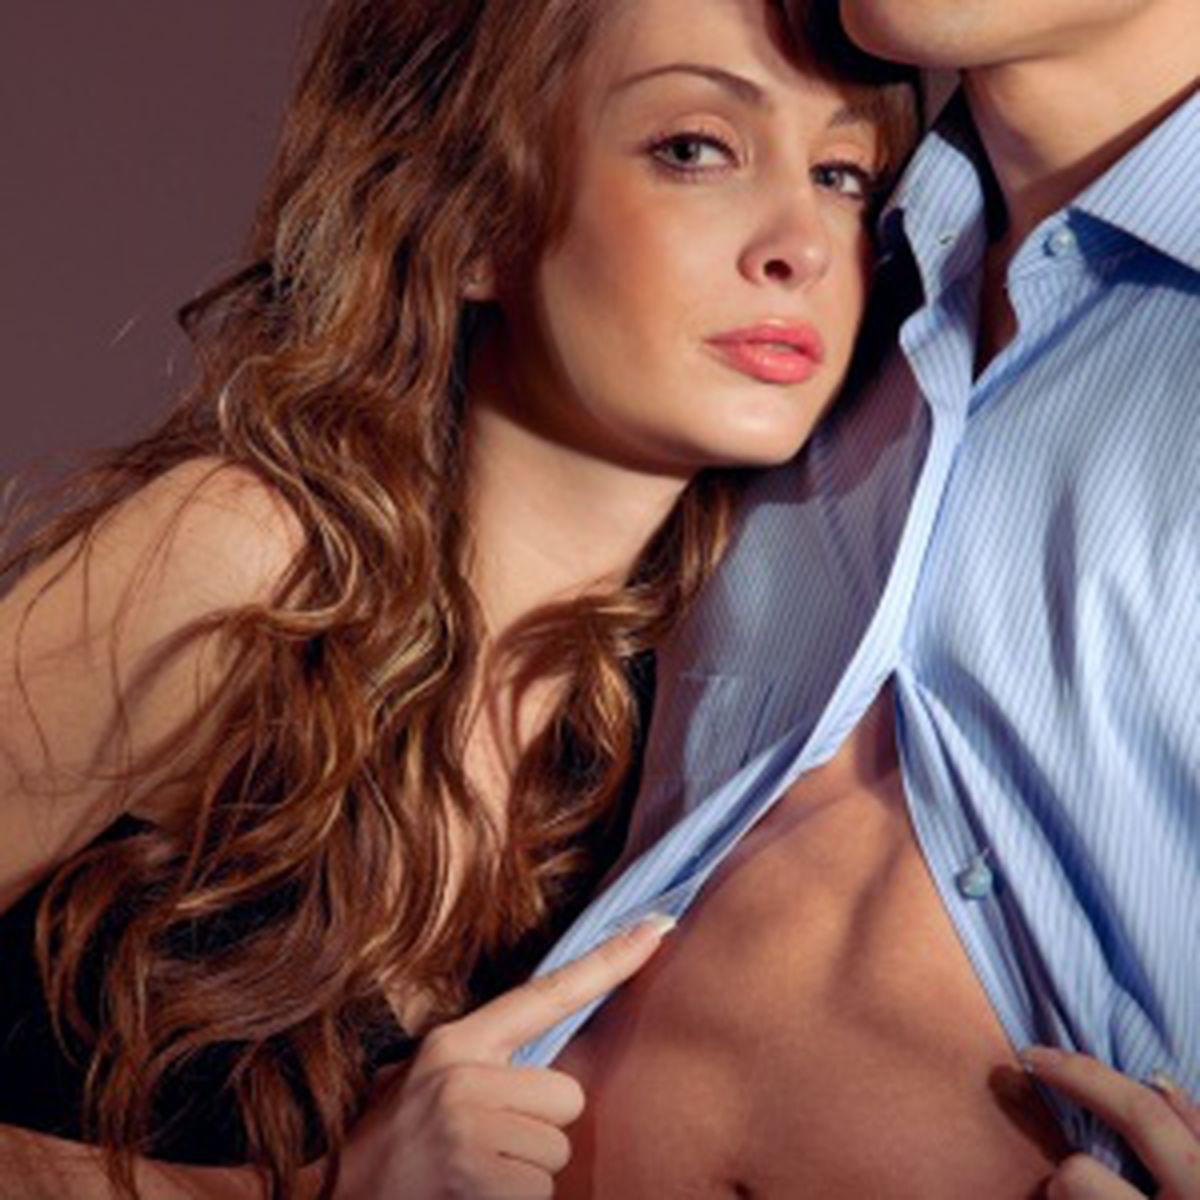 efectul amitriptilinei asupra erecției sensibilitate crescută a erecției